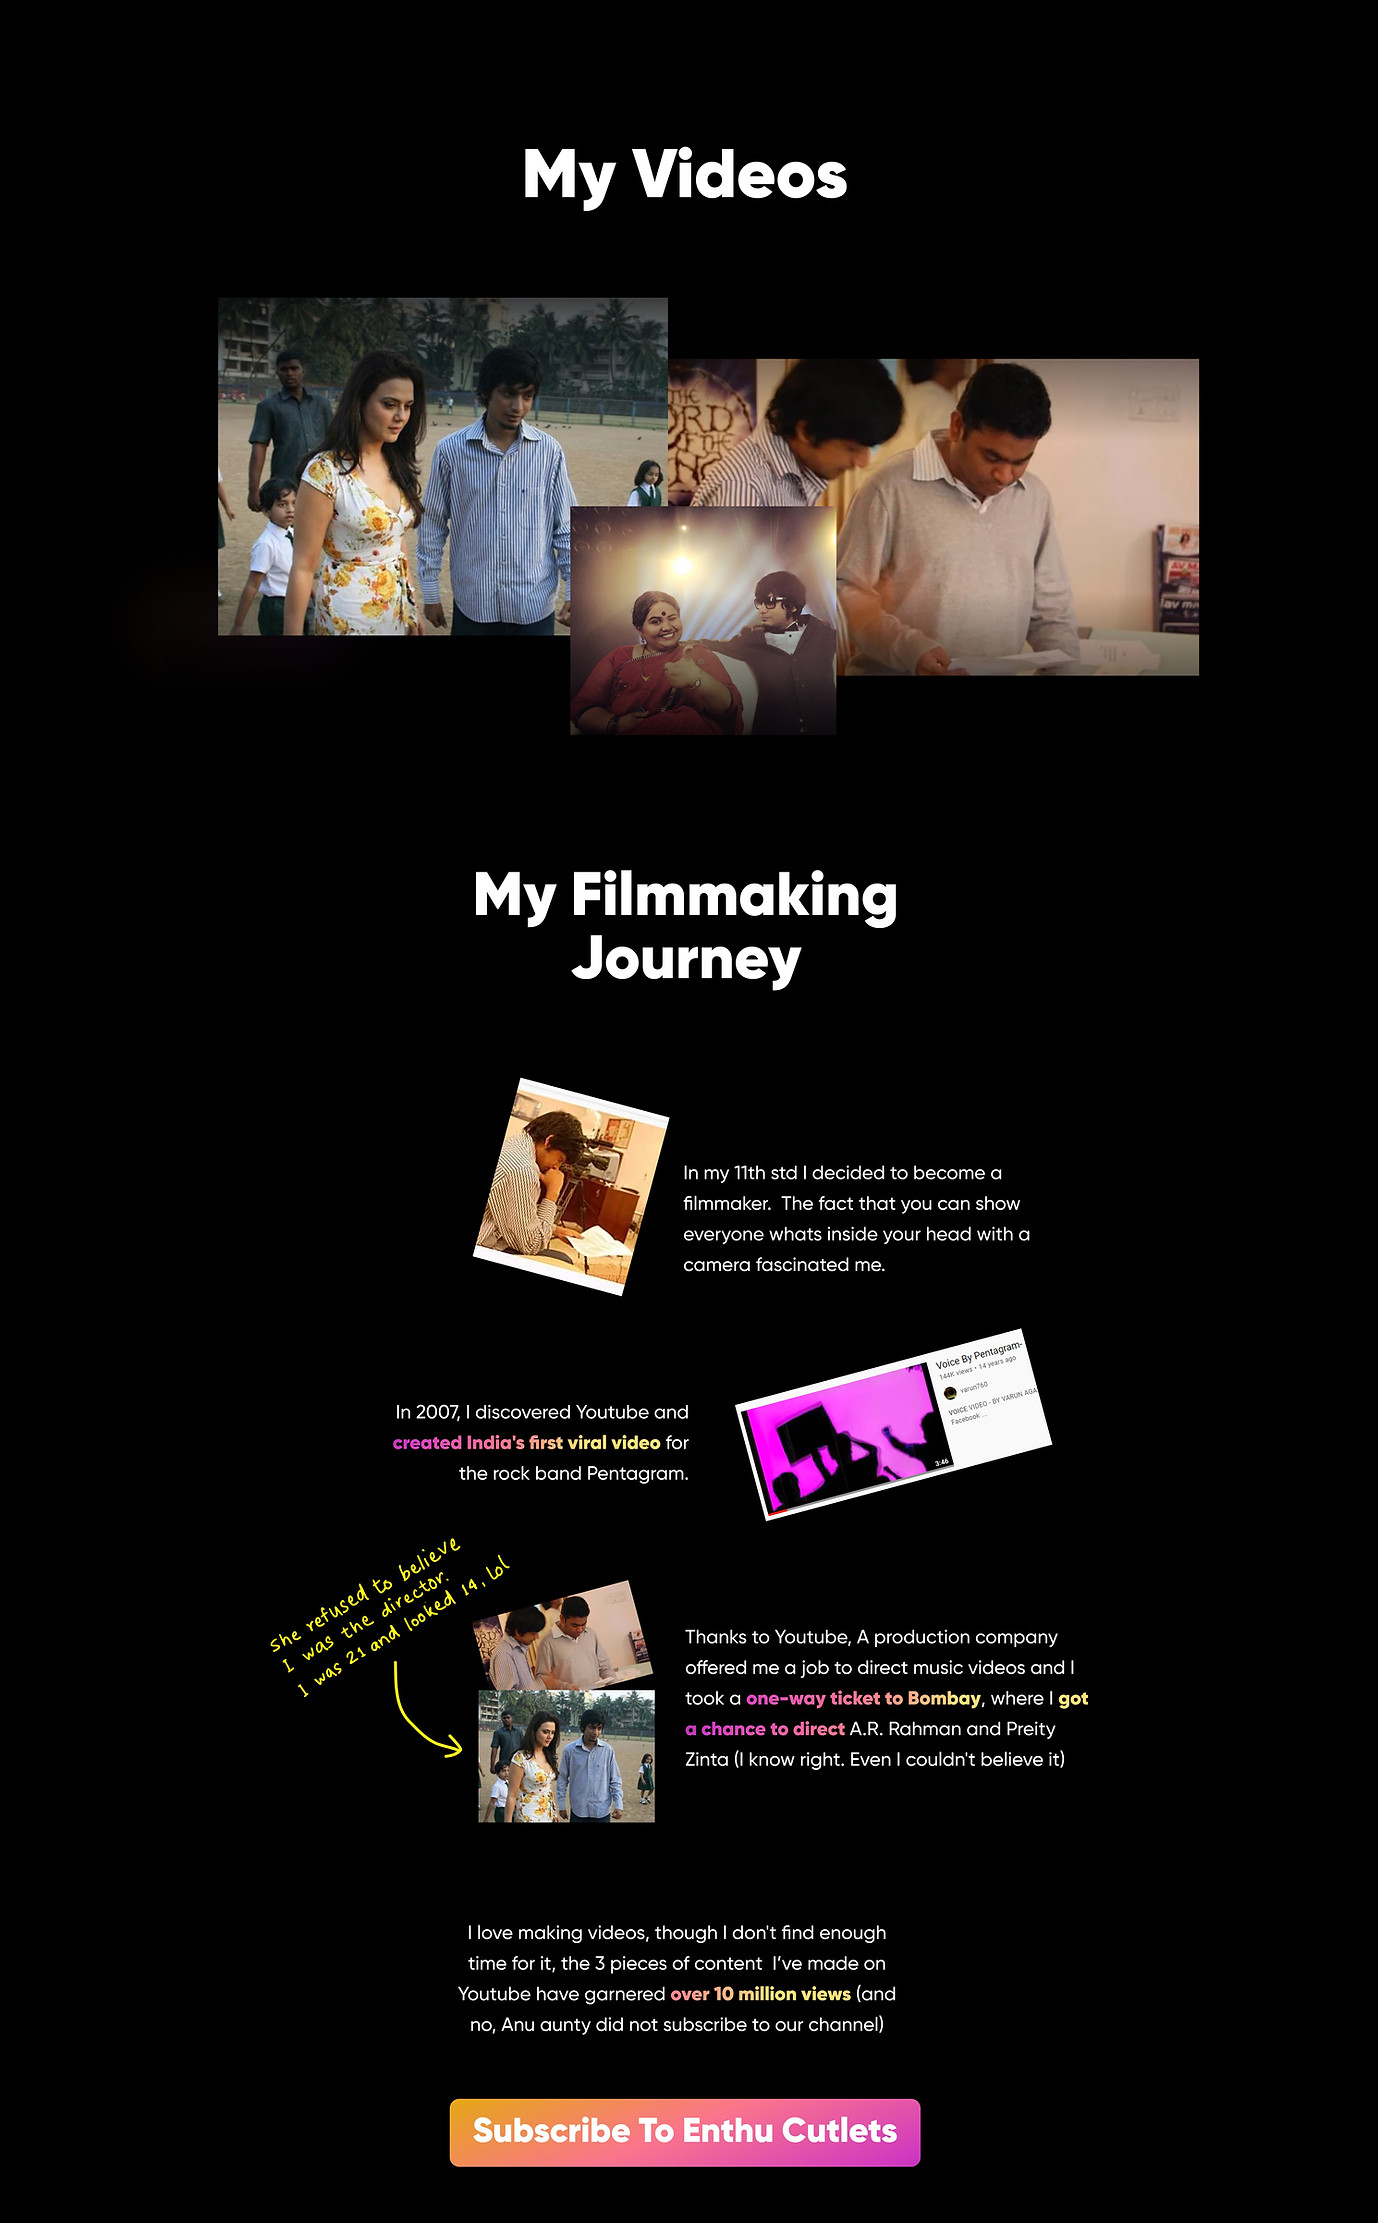 videos-d1.jpg